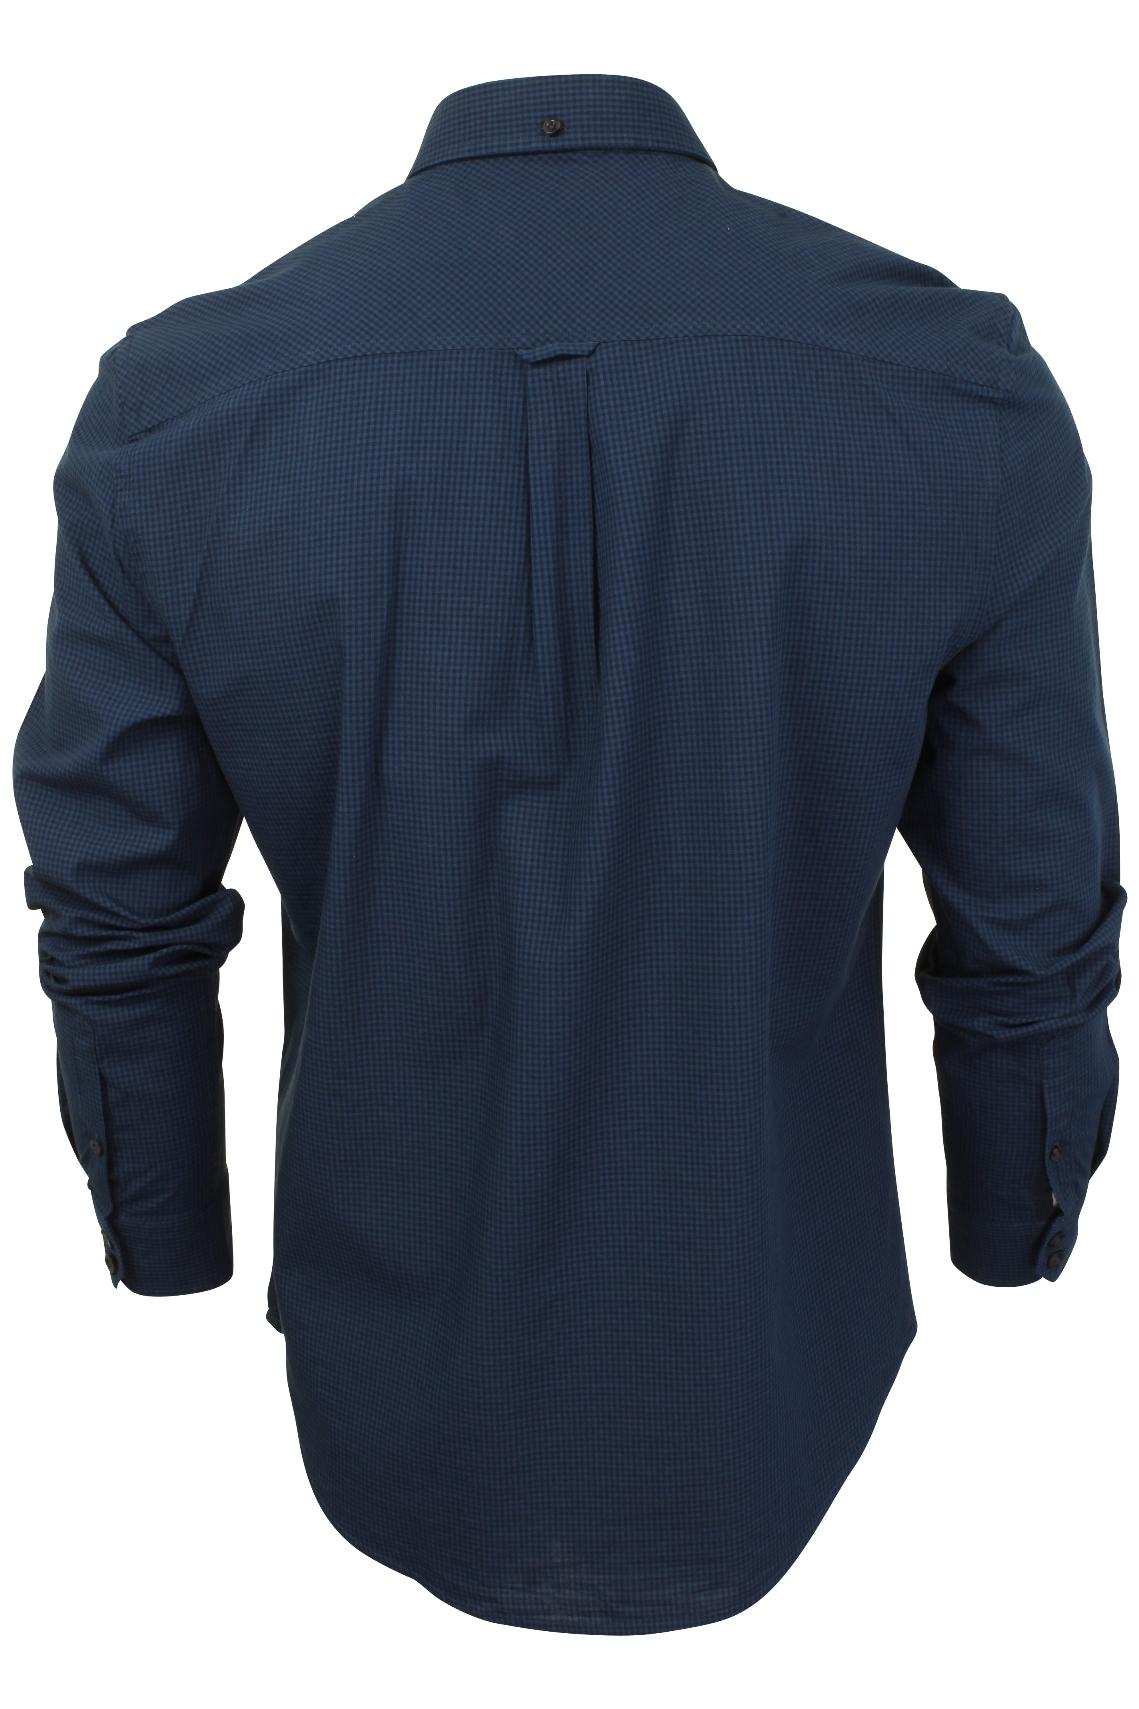 Mens-Classic-Gingham-Shirt-by-Ben-Sherman-Long-Sleeved thumbnail 8